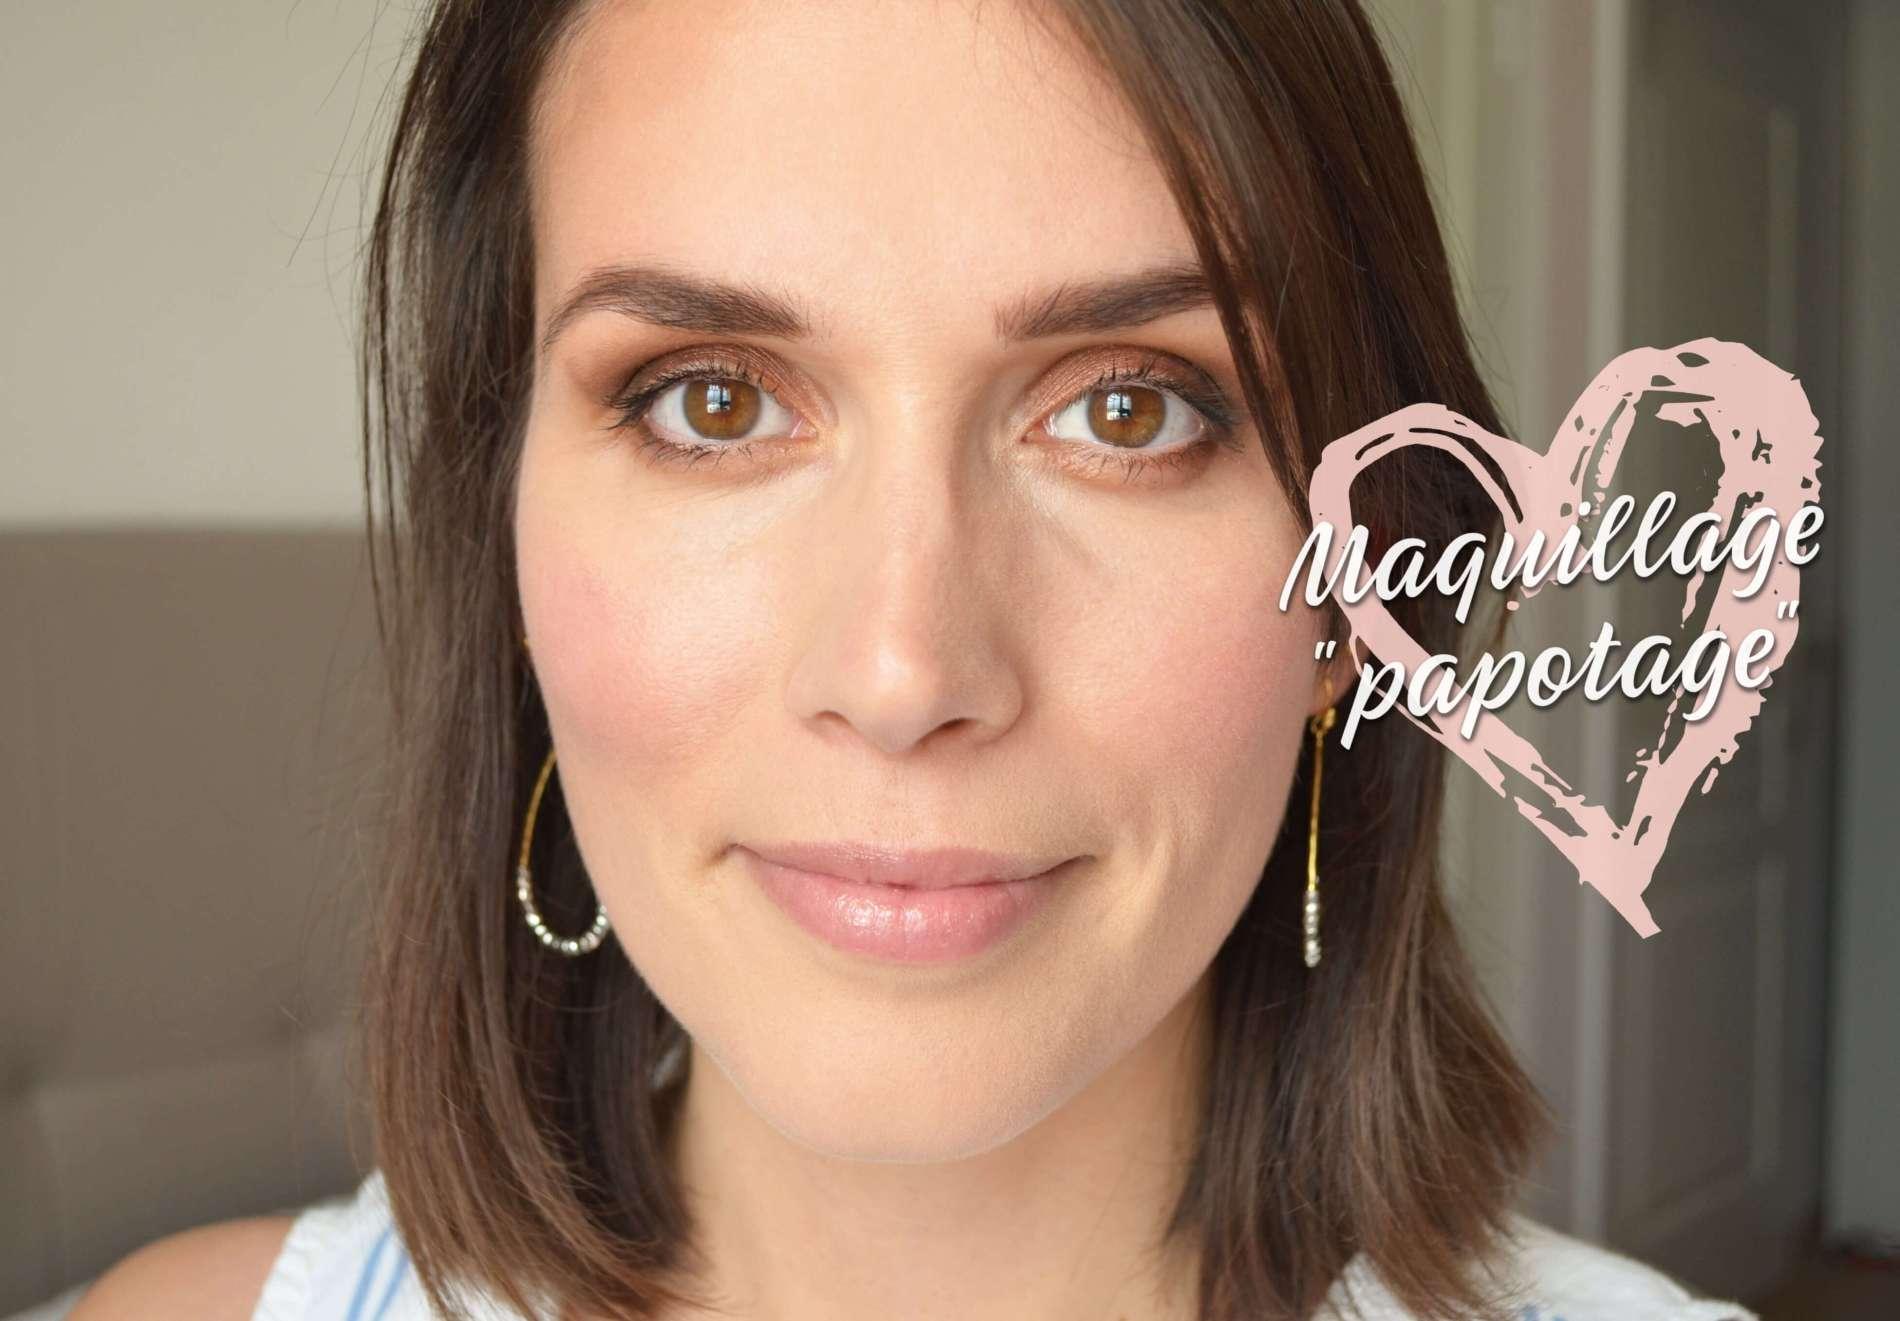 maquillage et papotage